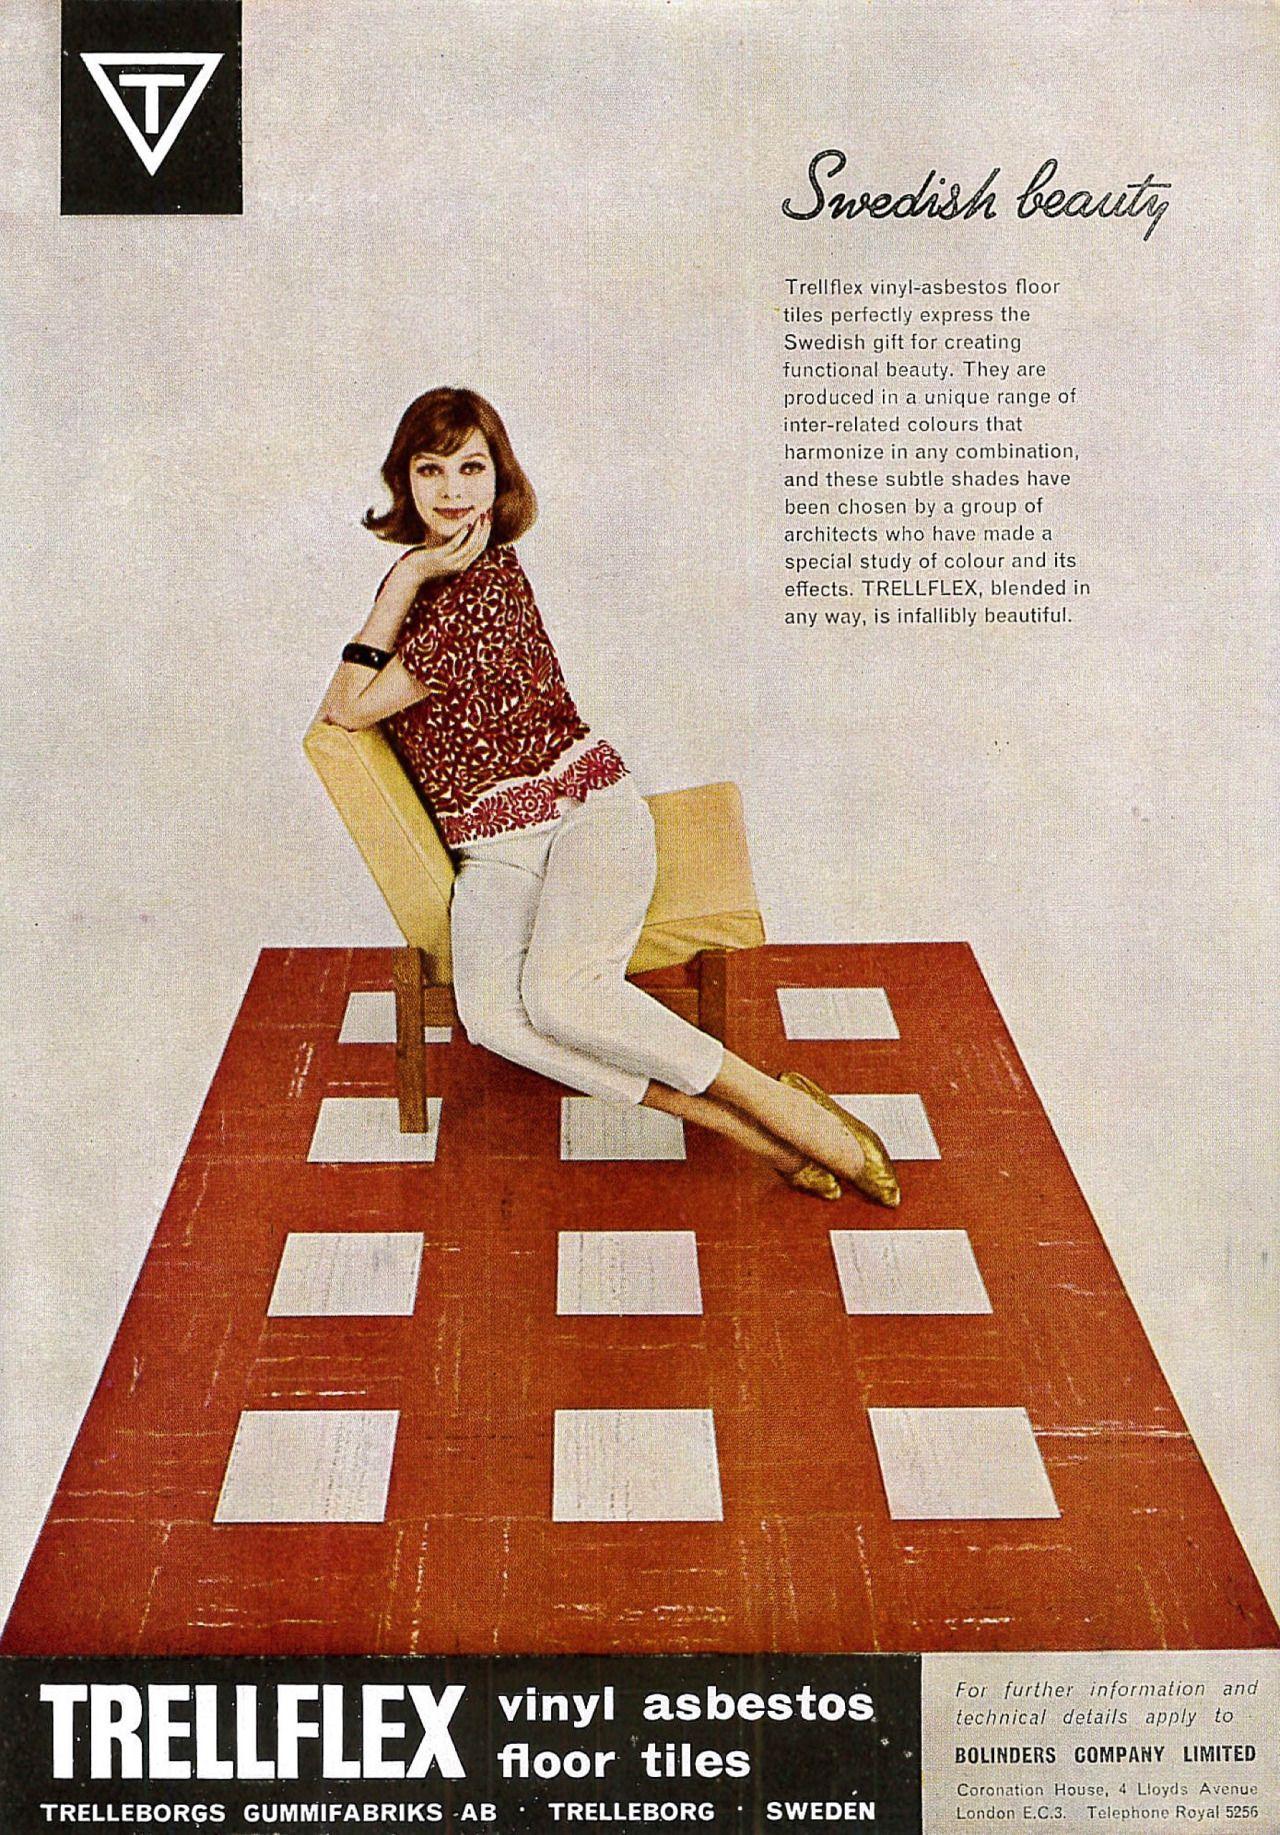 Bluecote Photo Asbestos Retro Advertising Vintage Ads